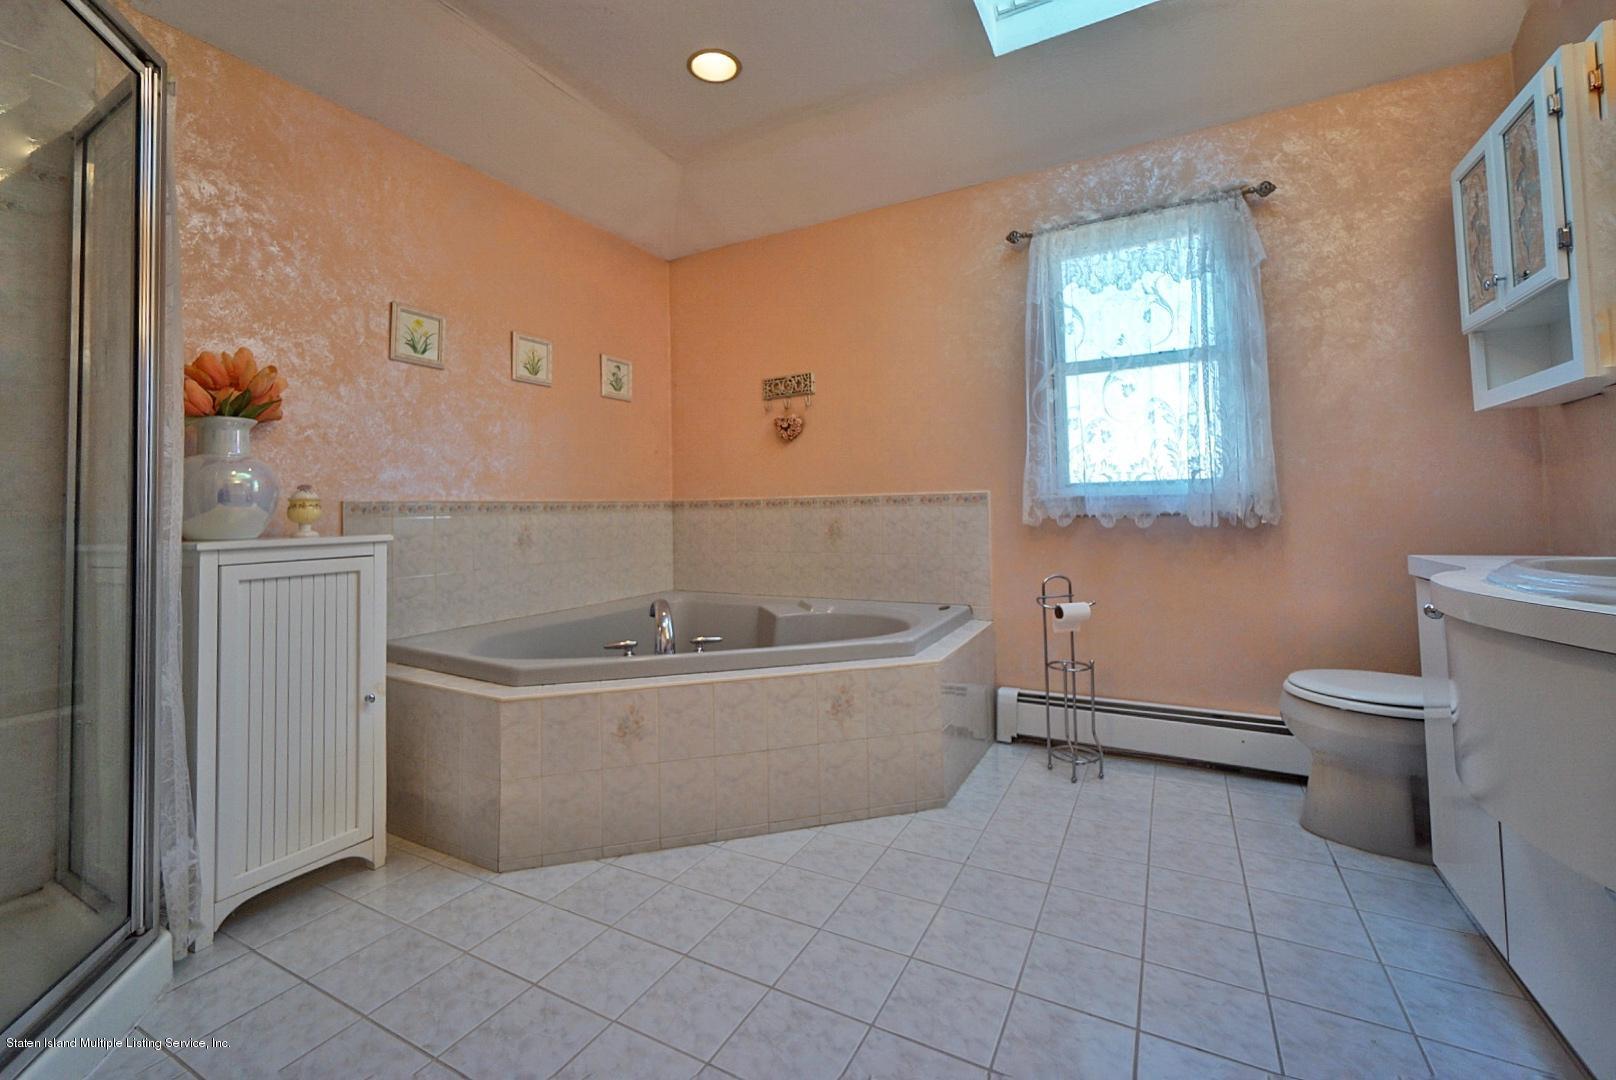 Single Family - Detached 120 Nashville Street  Staten Island, NY 10307, MLS-1127085-31